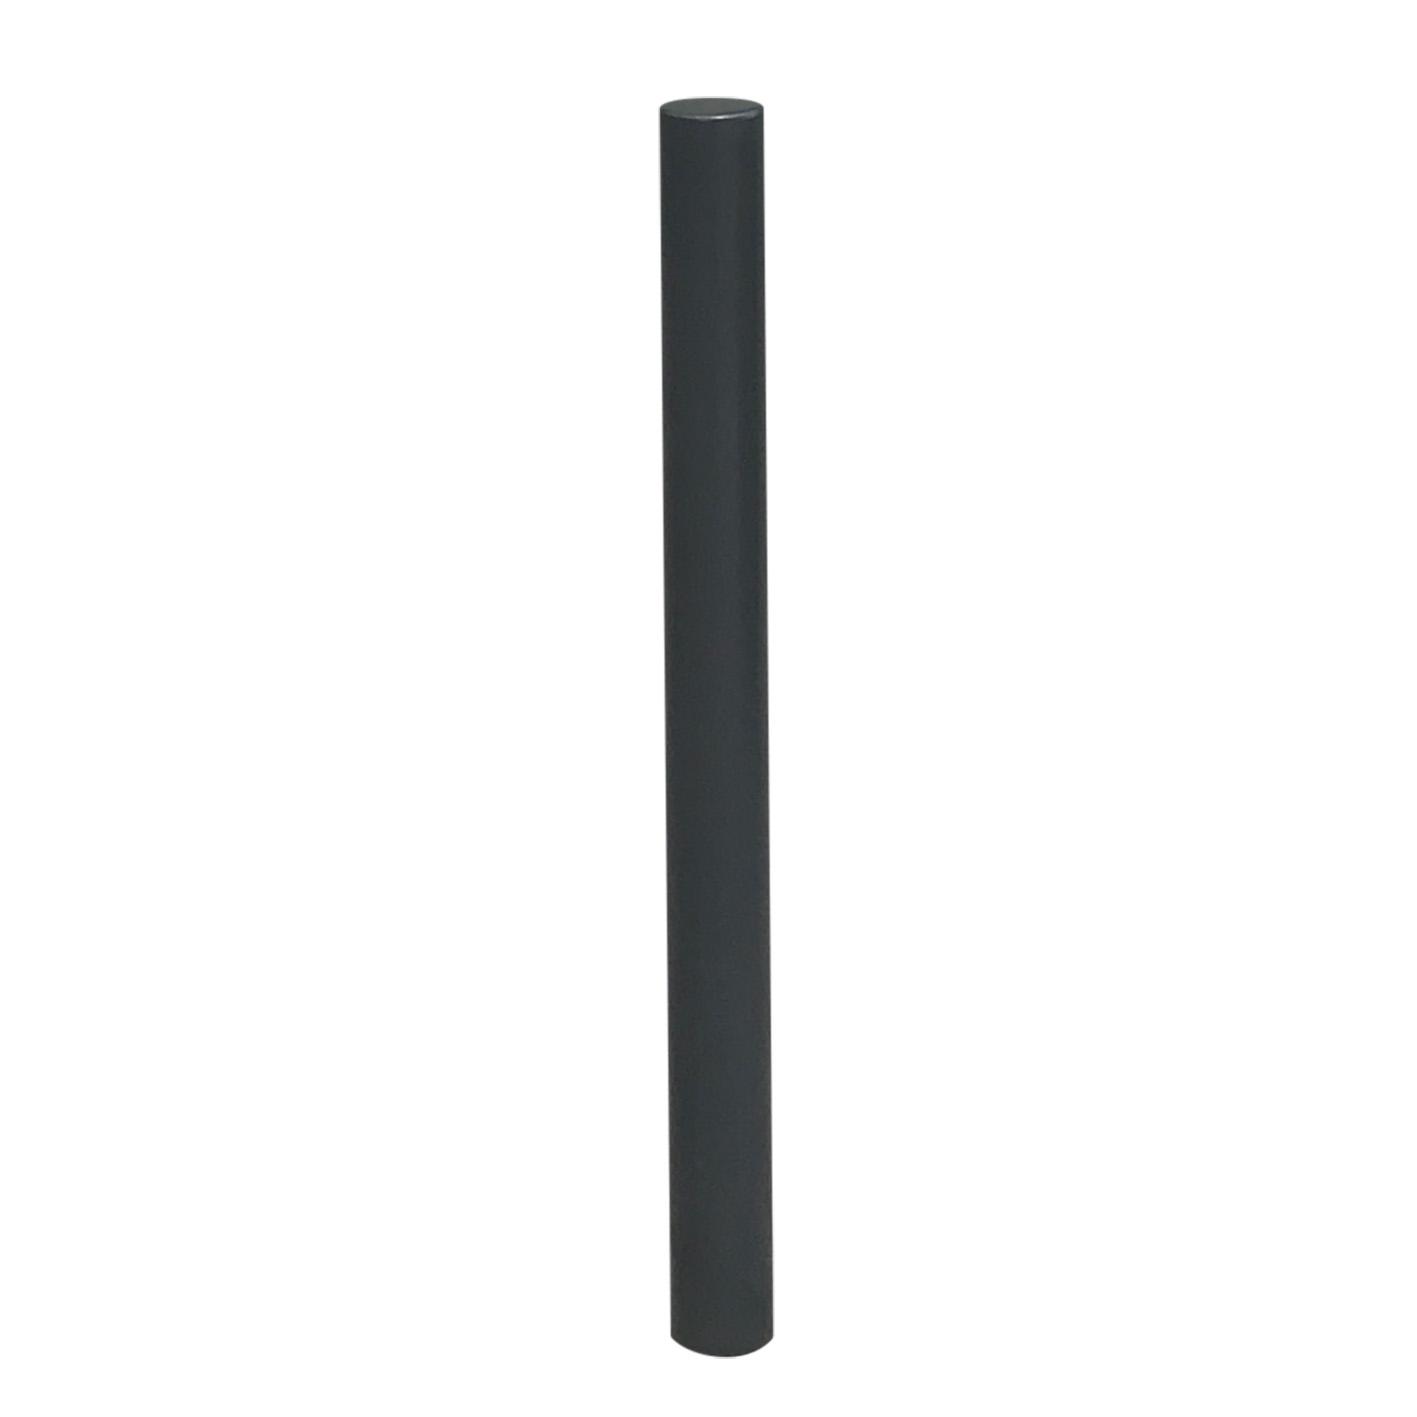 Absperrpfosten 4084 |  Ø 89 x 950 mm